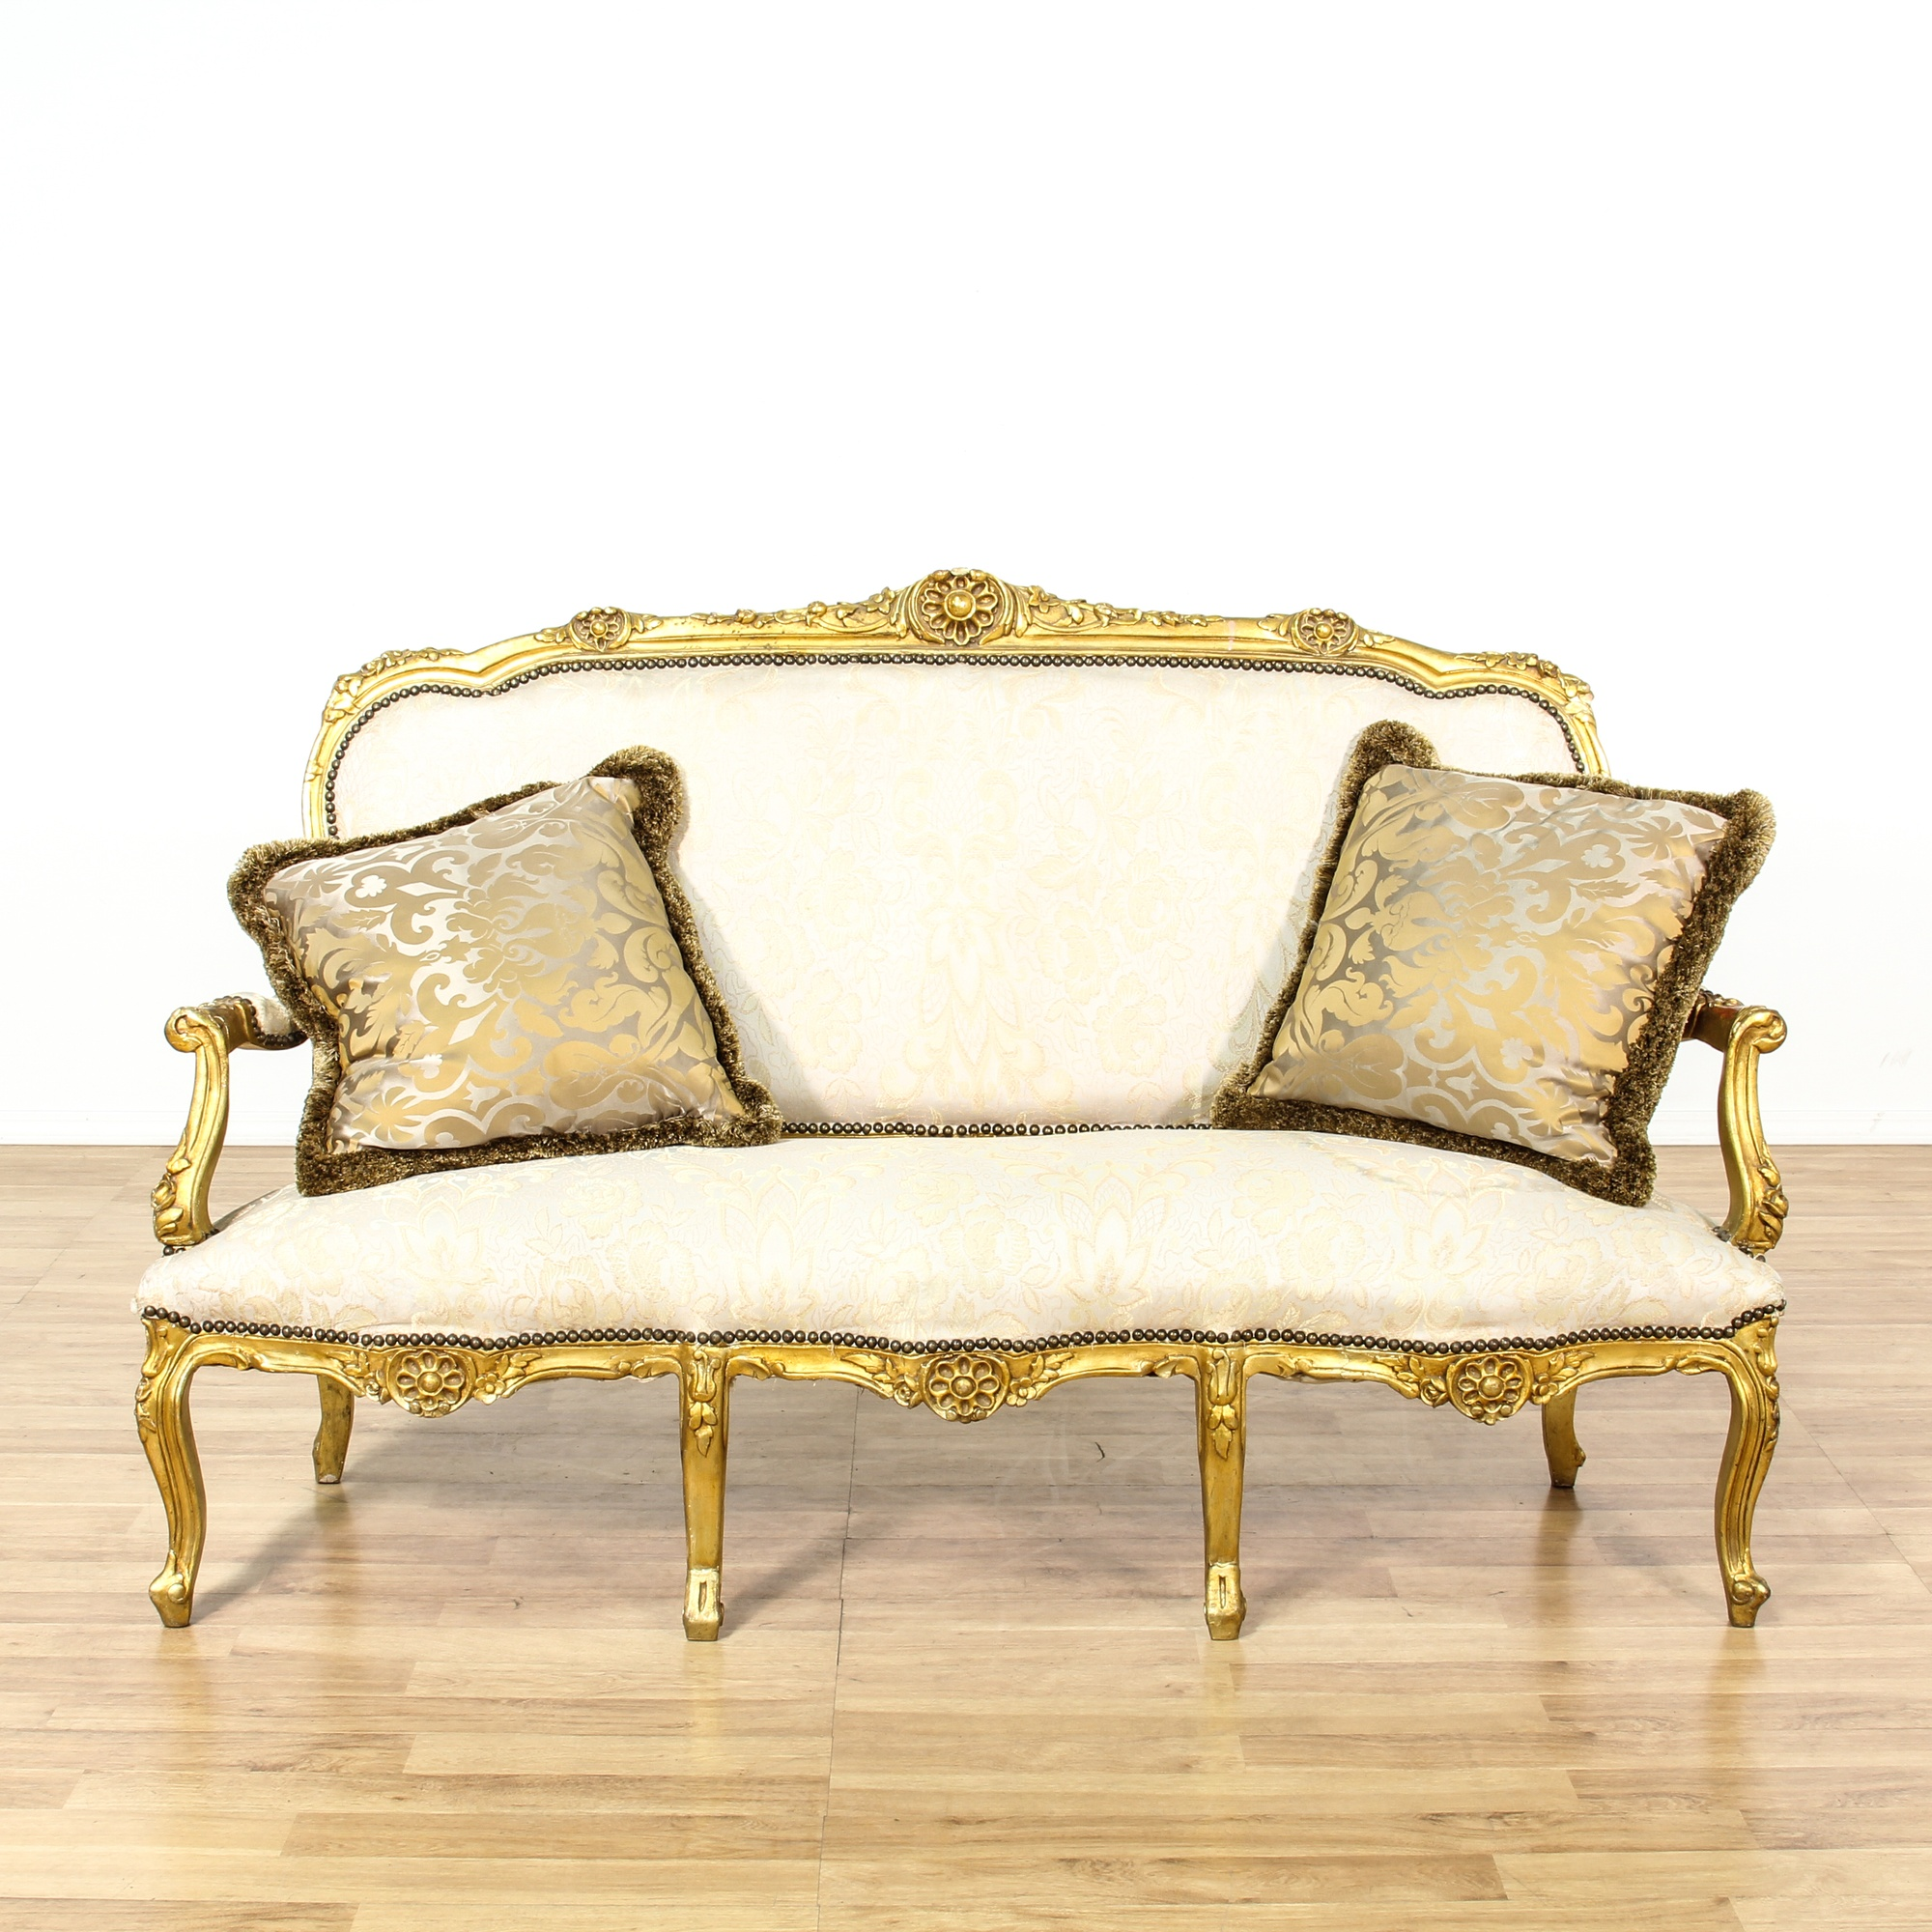 Louis Xv Style Gilt Gold Cream Settee Sofa Loveseat Vintage Furniture San Diego Los Angeles